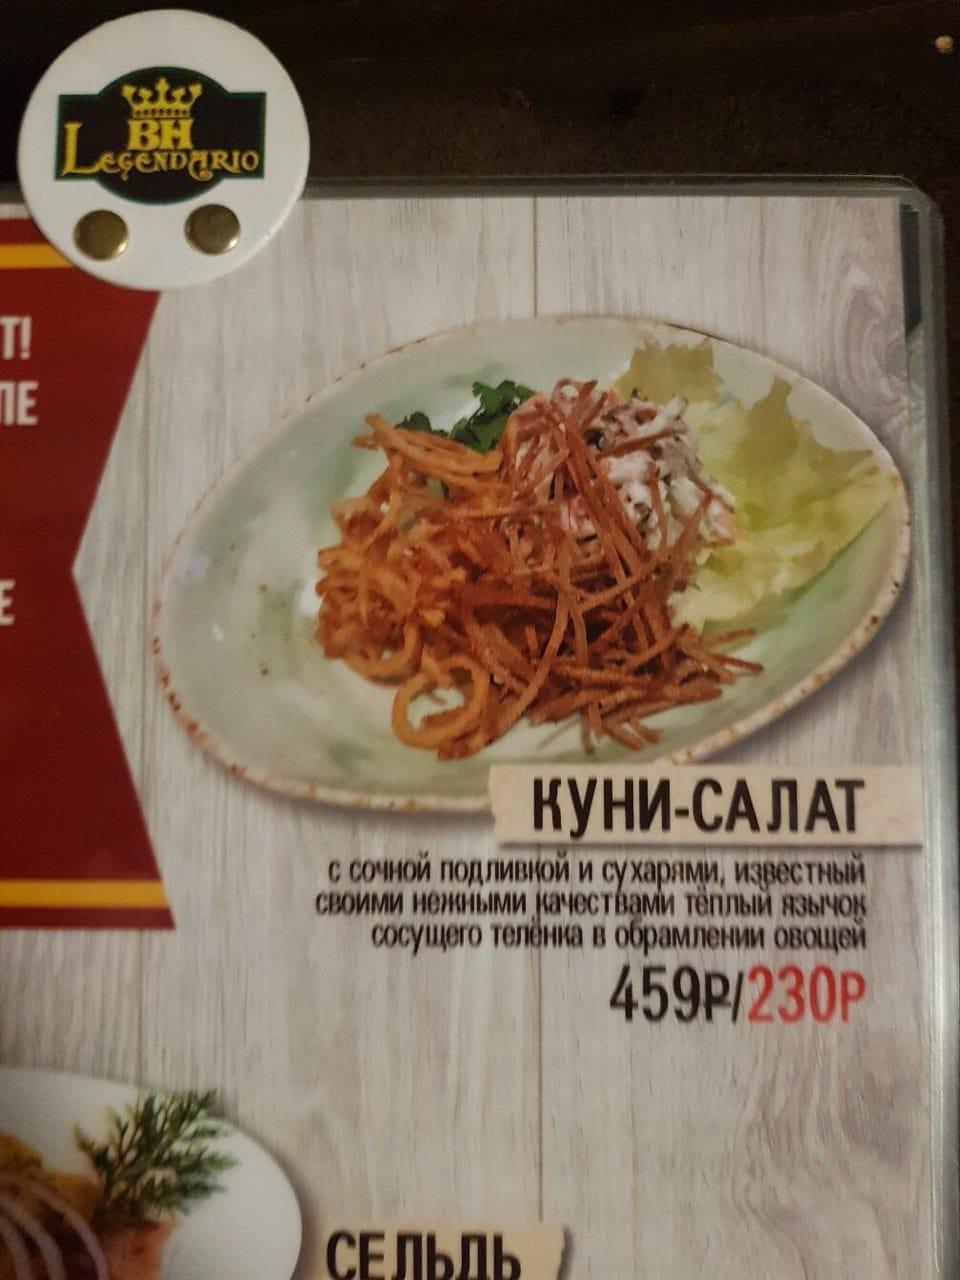 https://ic.pics.livejournal.com/yuripasholok/765139/13501125/13501125_original.jpg